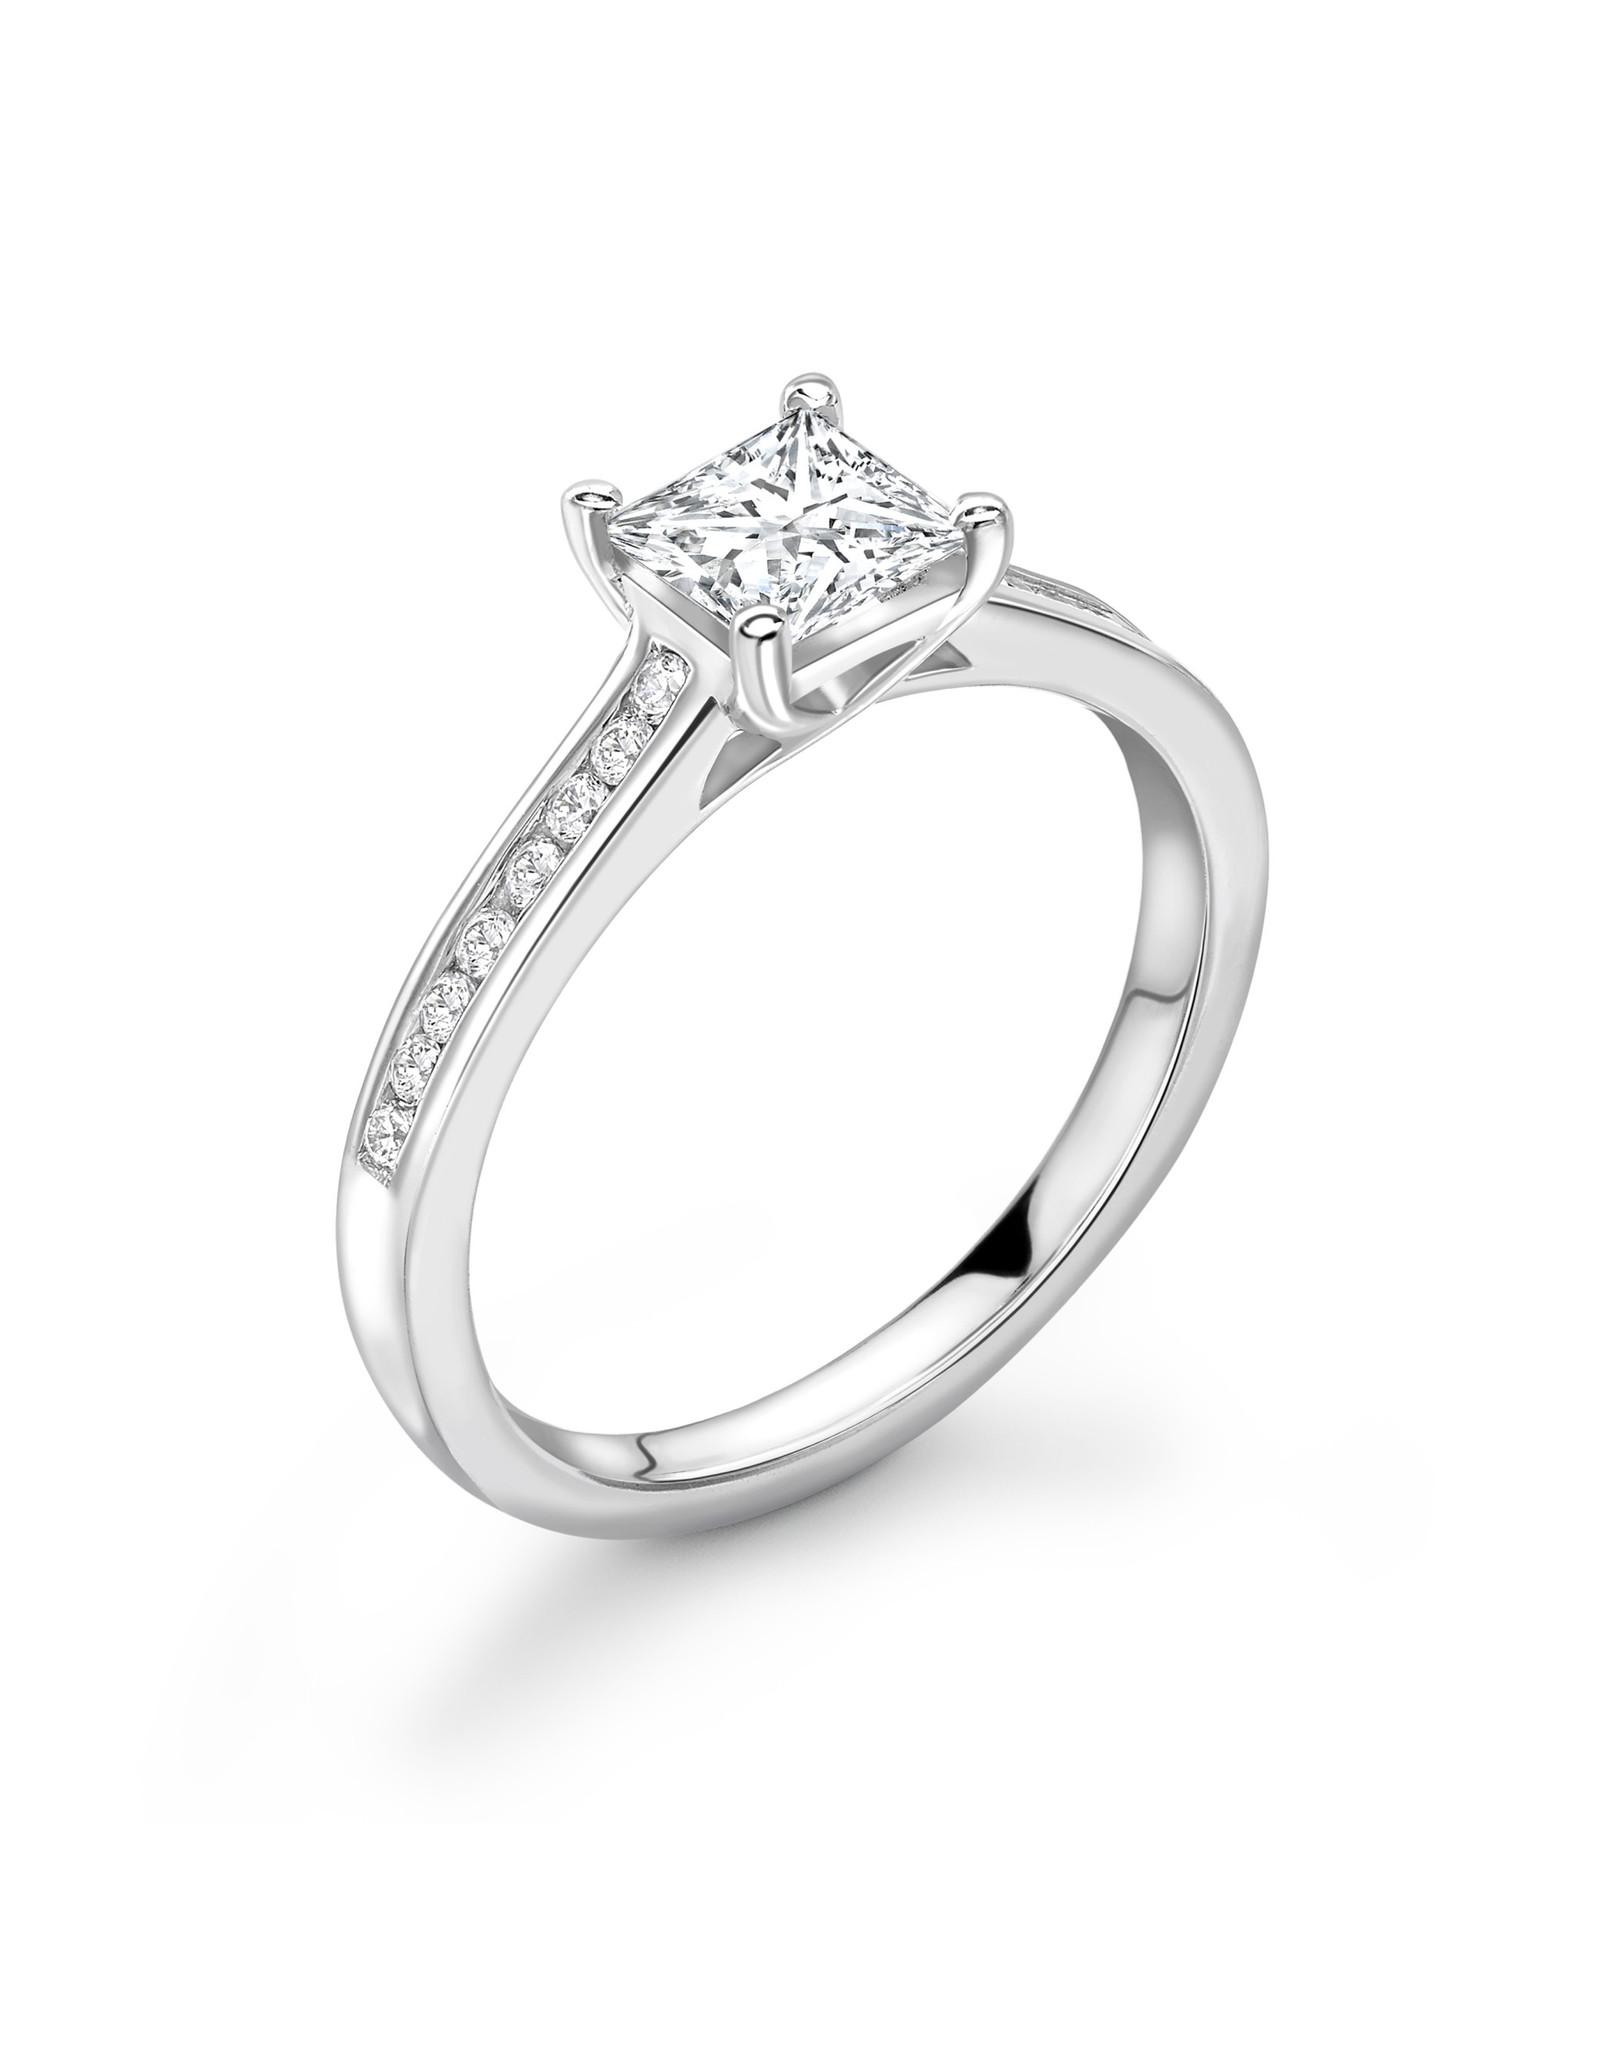 LVN Princesse Verlovingsring Met Zijsteentjes LVNRX3978